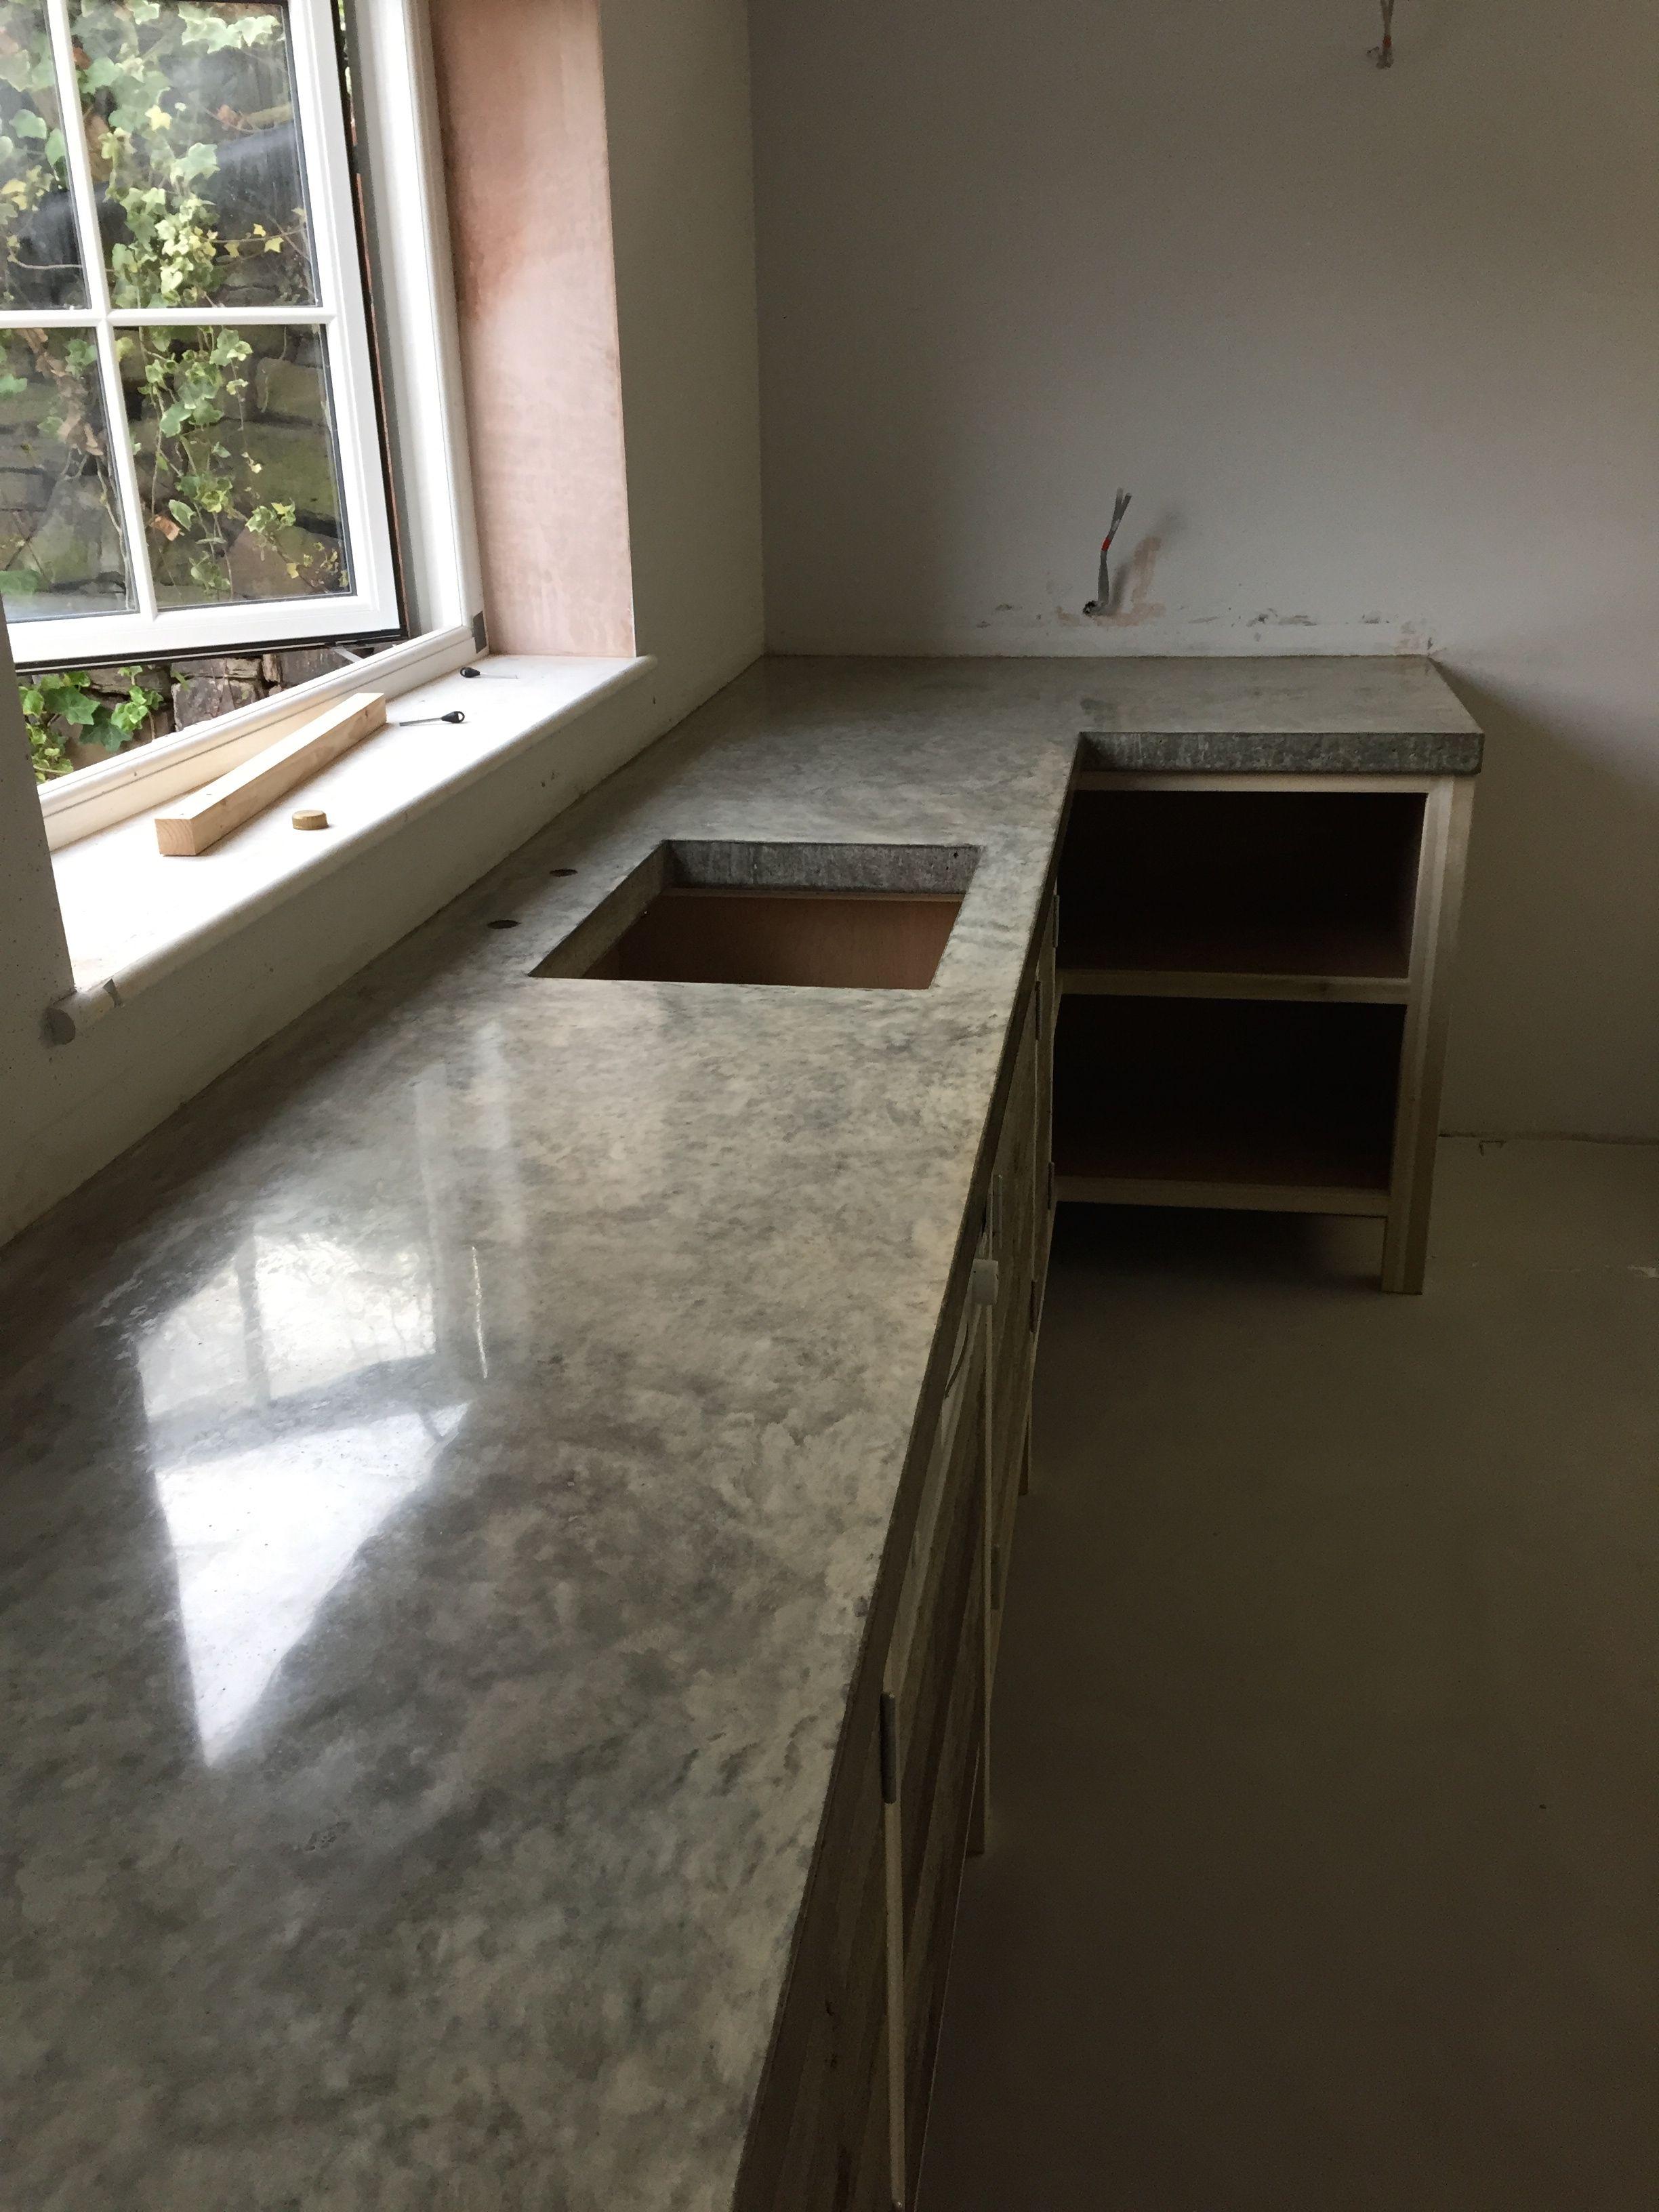 polished concrete worktop cast in situ. no joins arnoldskitchens